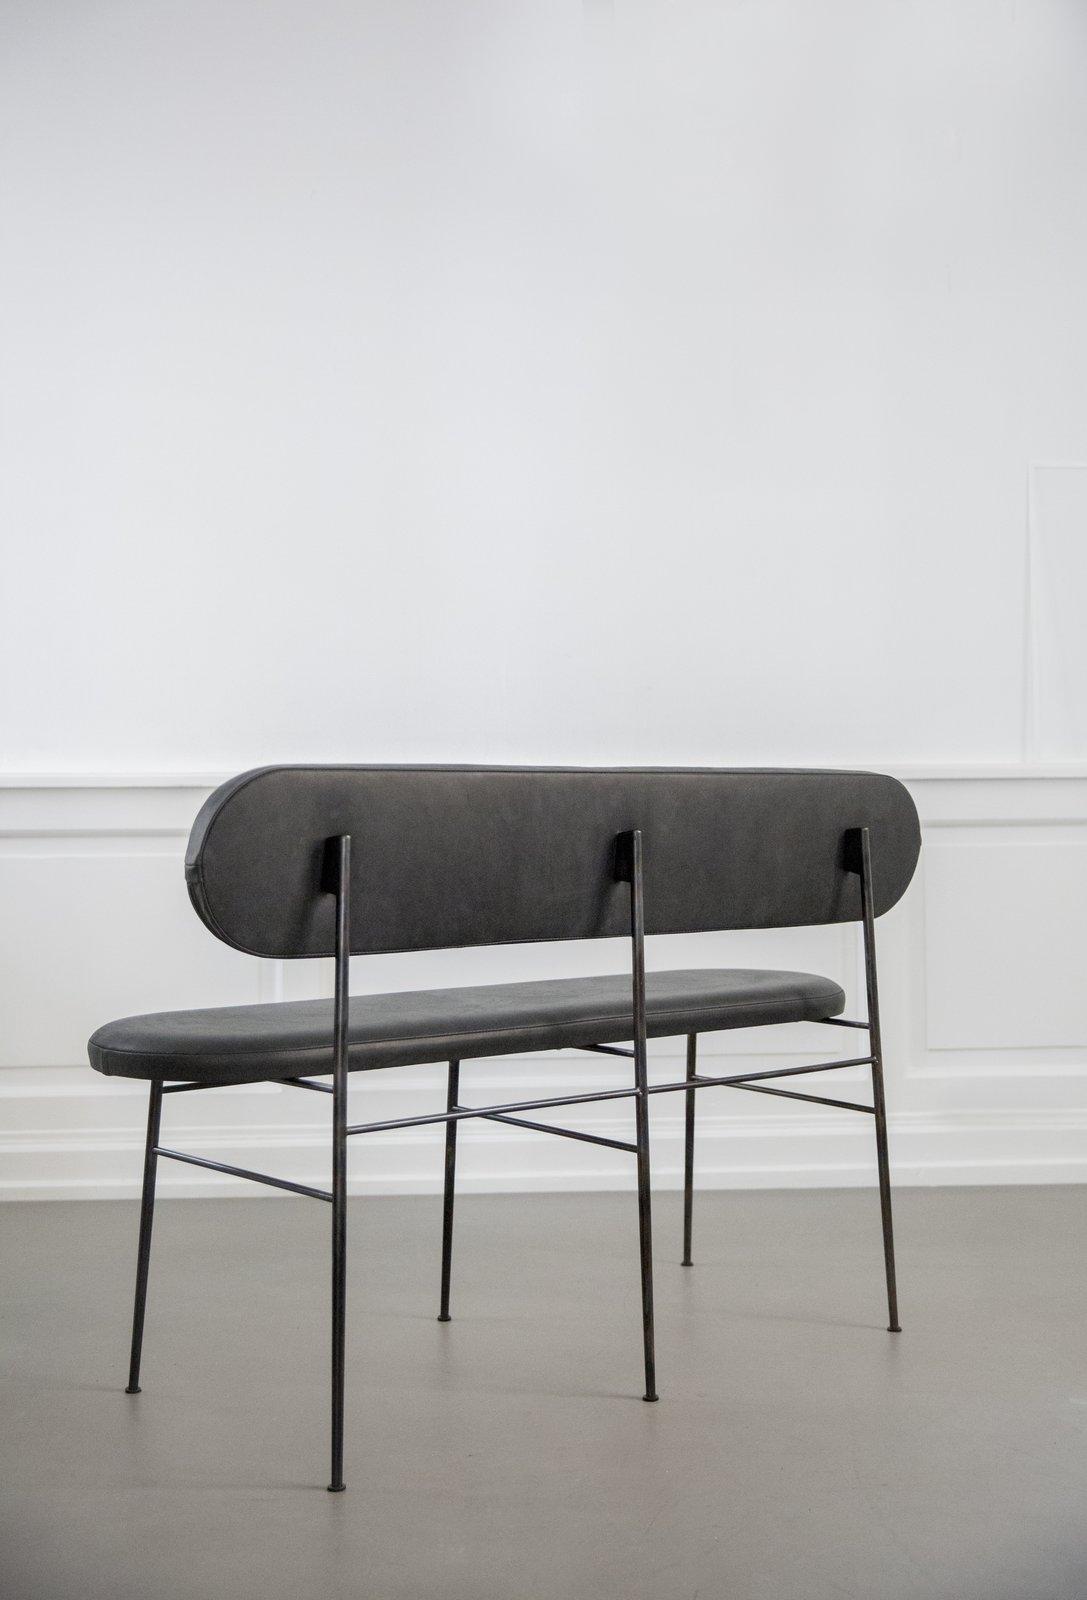 Photo 12 of 12 in Spotlight on Multidisciplinary Danish Design Studio, Norm Architects